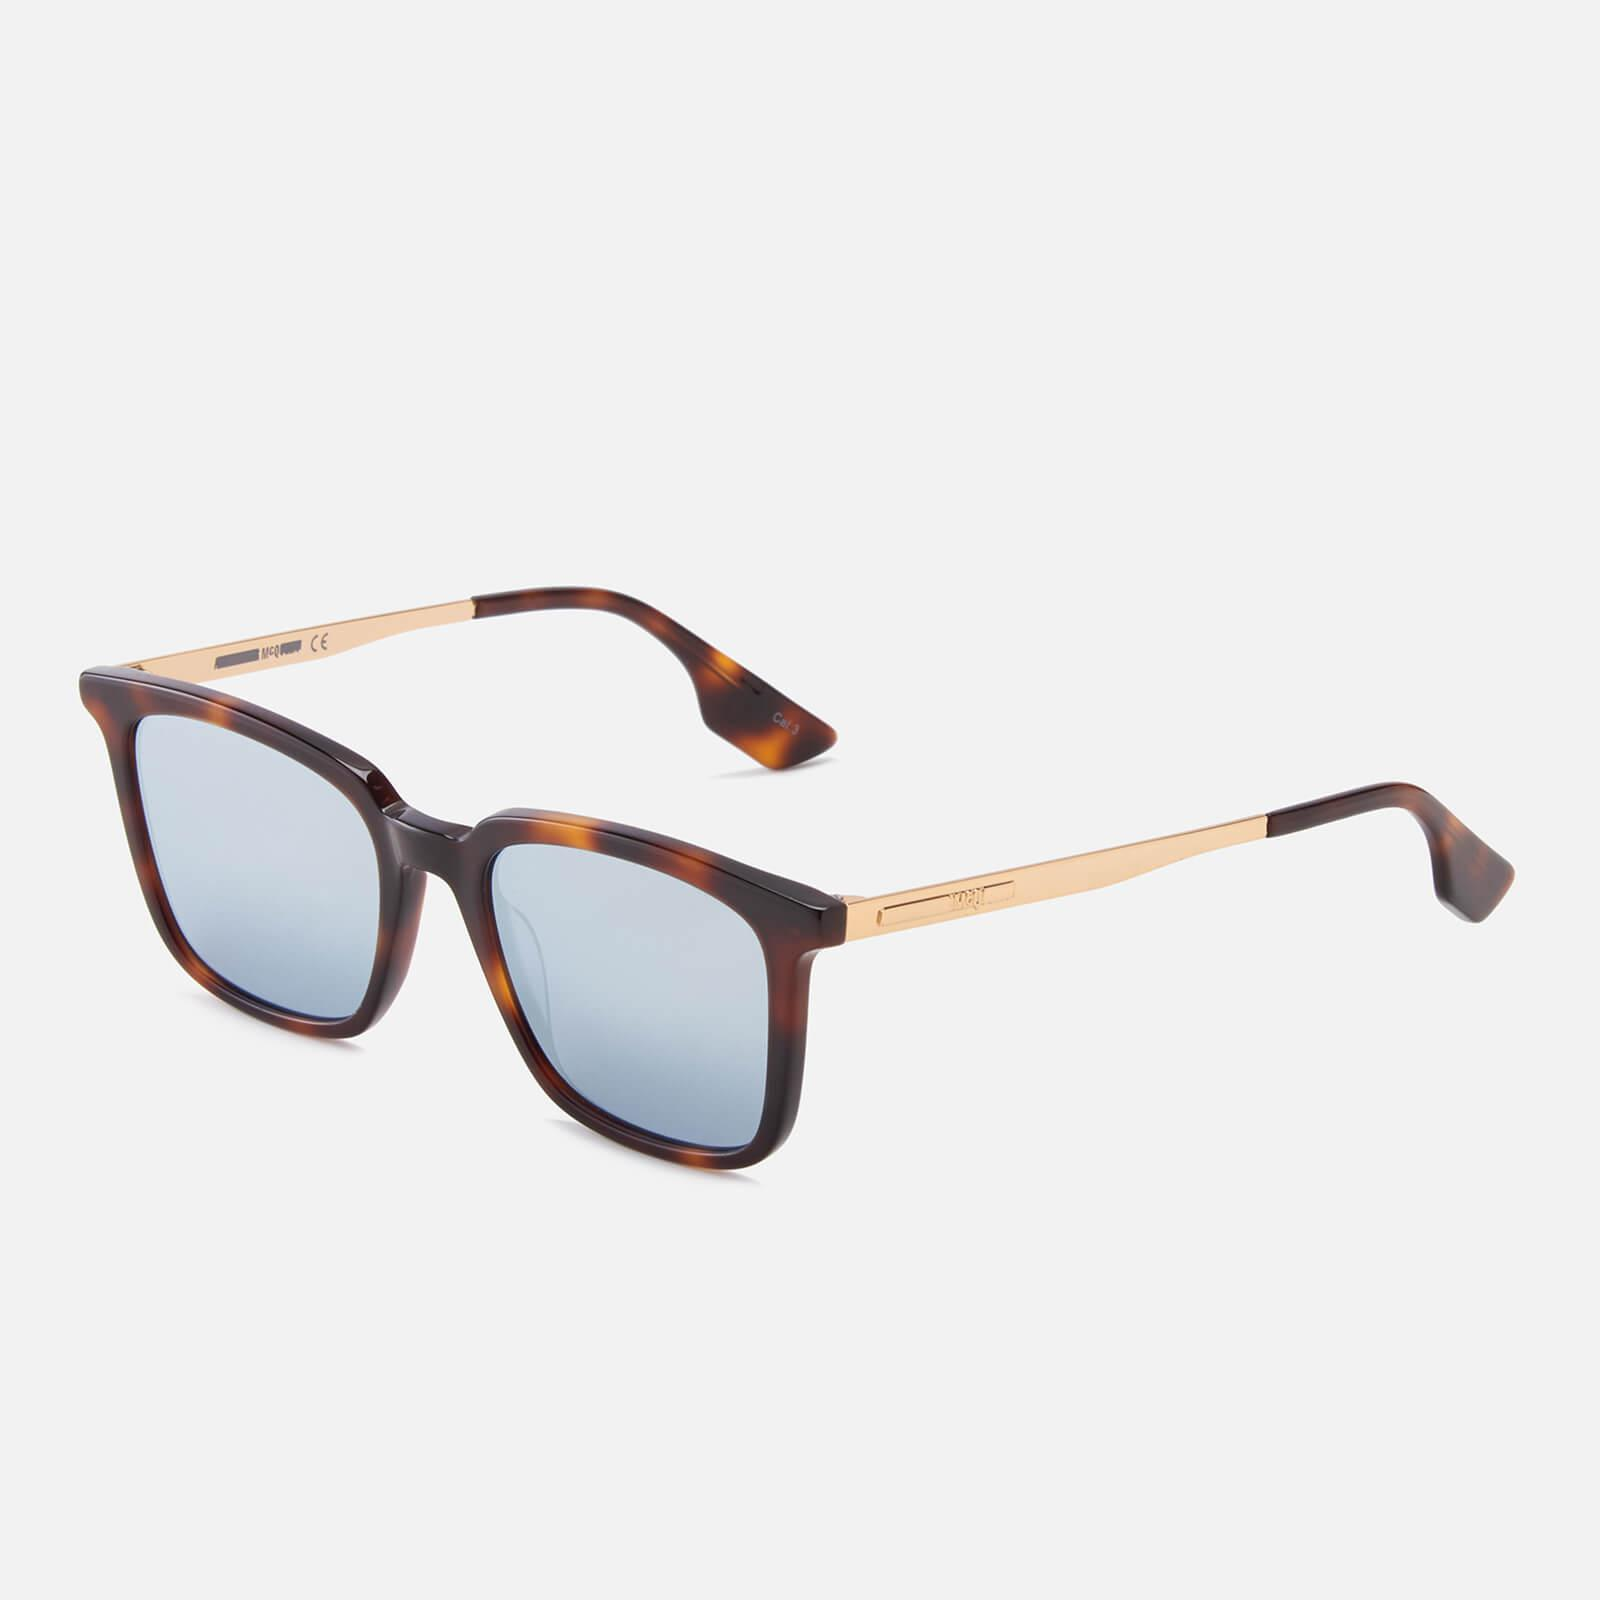 ffb1474ab0 McQ Alexander McQueen - Multicolor Tortoise Shell Sunglasses - Lyst. View  fullscreen